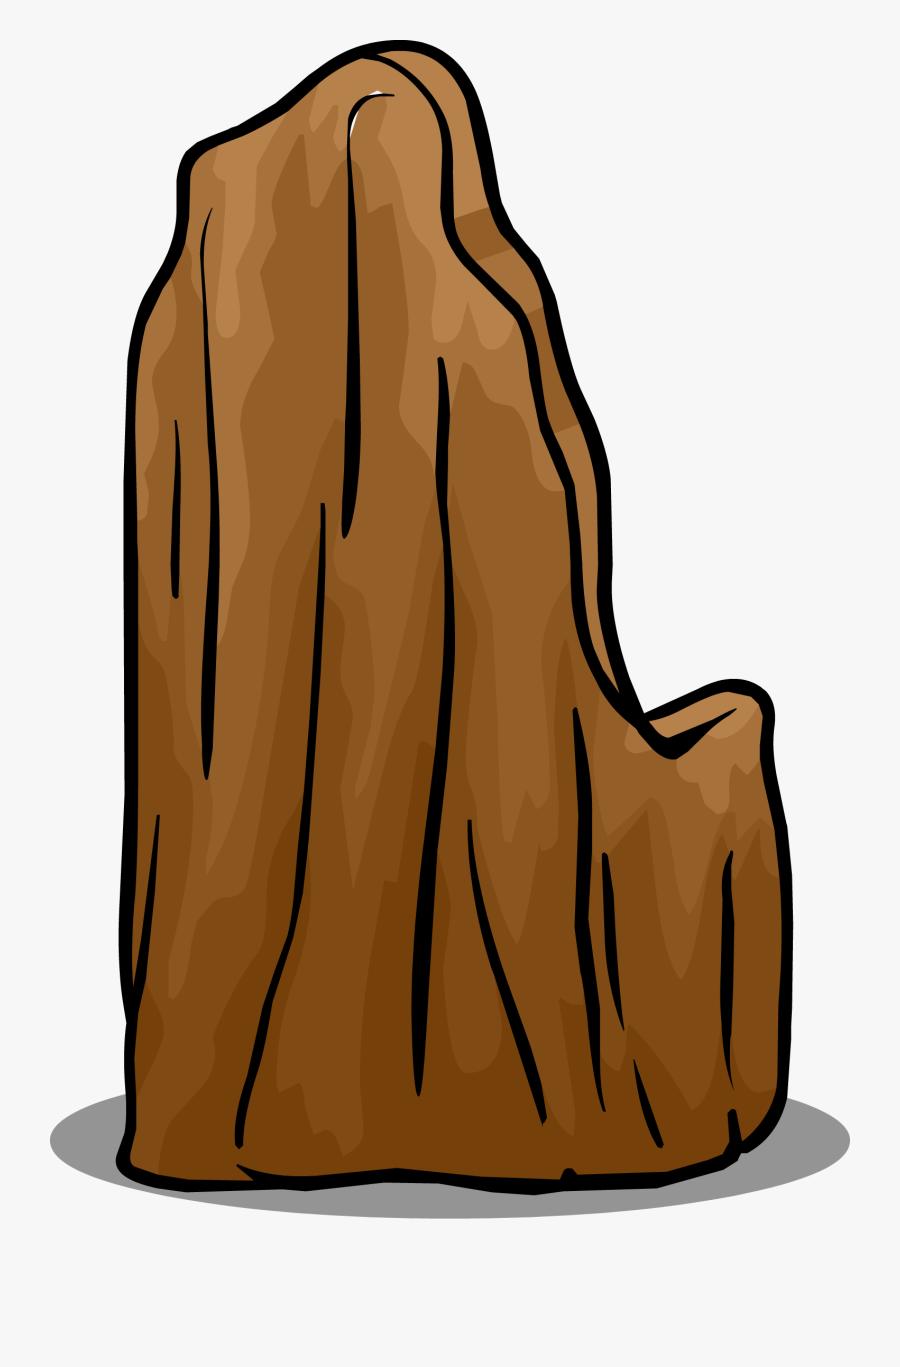 Image Tree Chair Sprite, Transparent Clipart